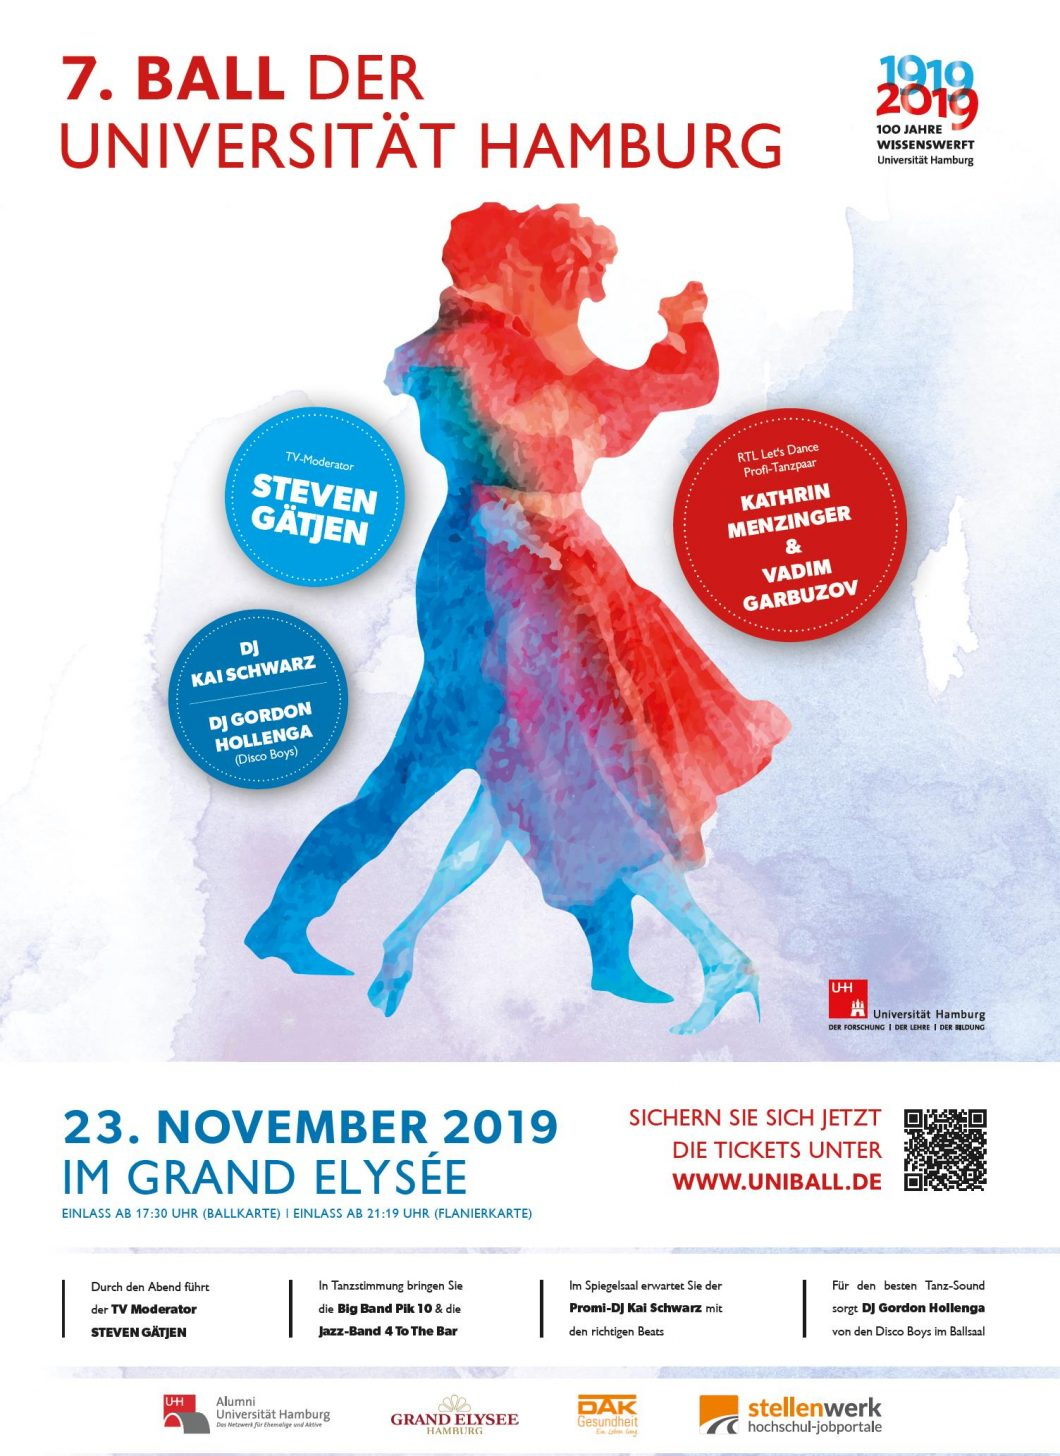 7. Ball der Universität Hamburg am 23. November 2019